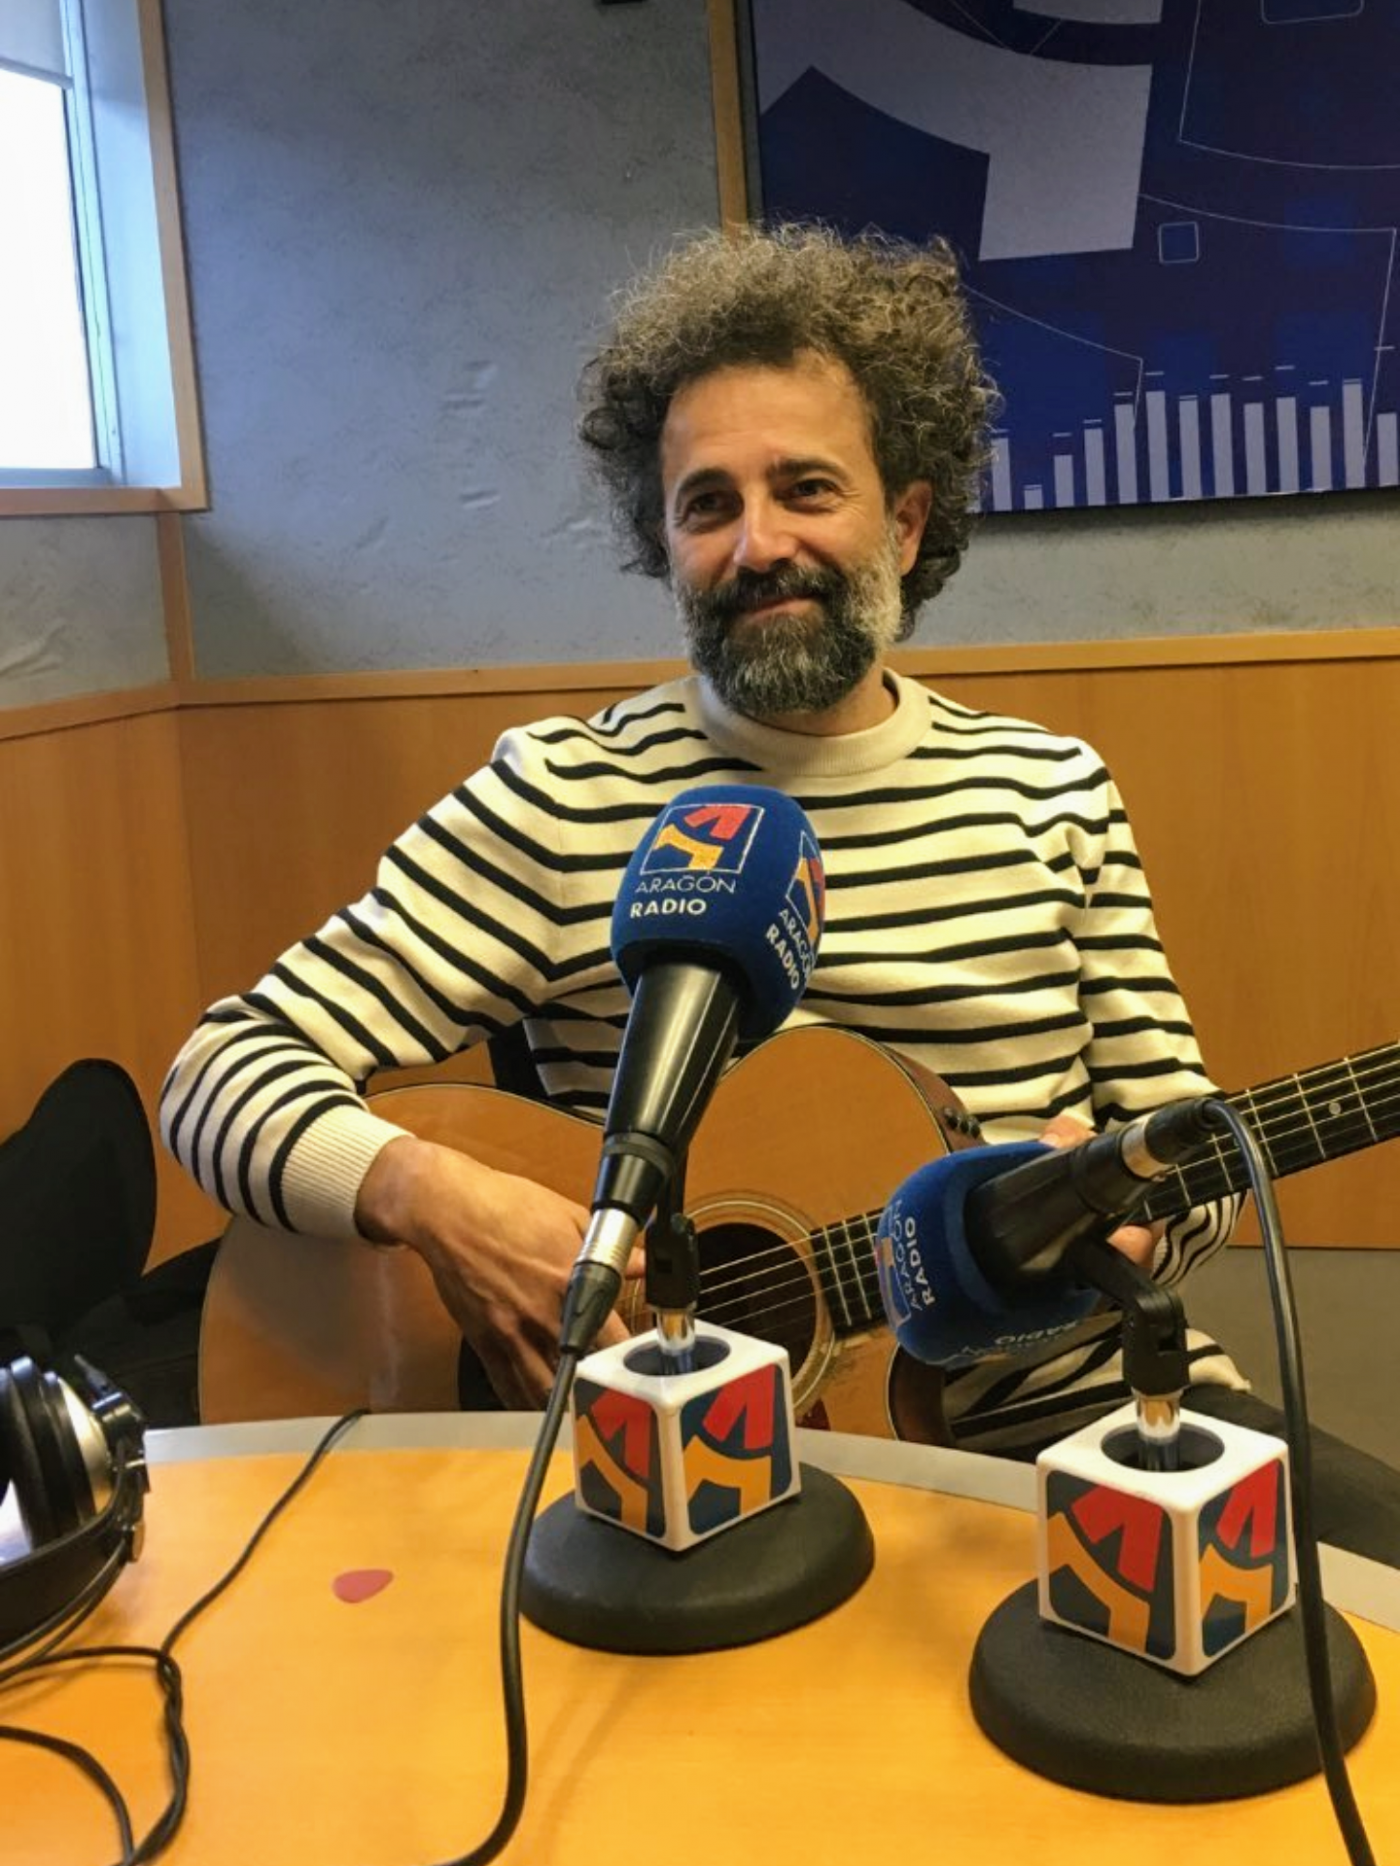 Pecker en Aragon Radio Huesca